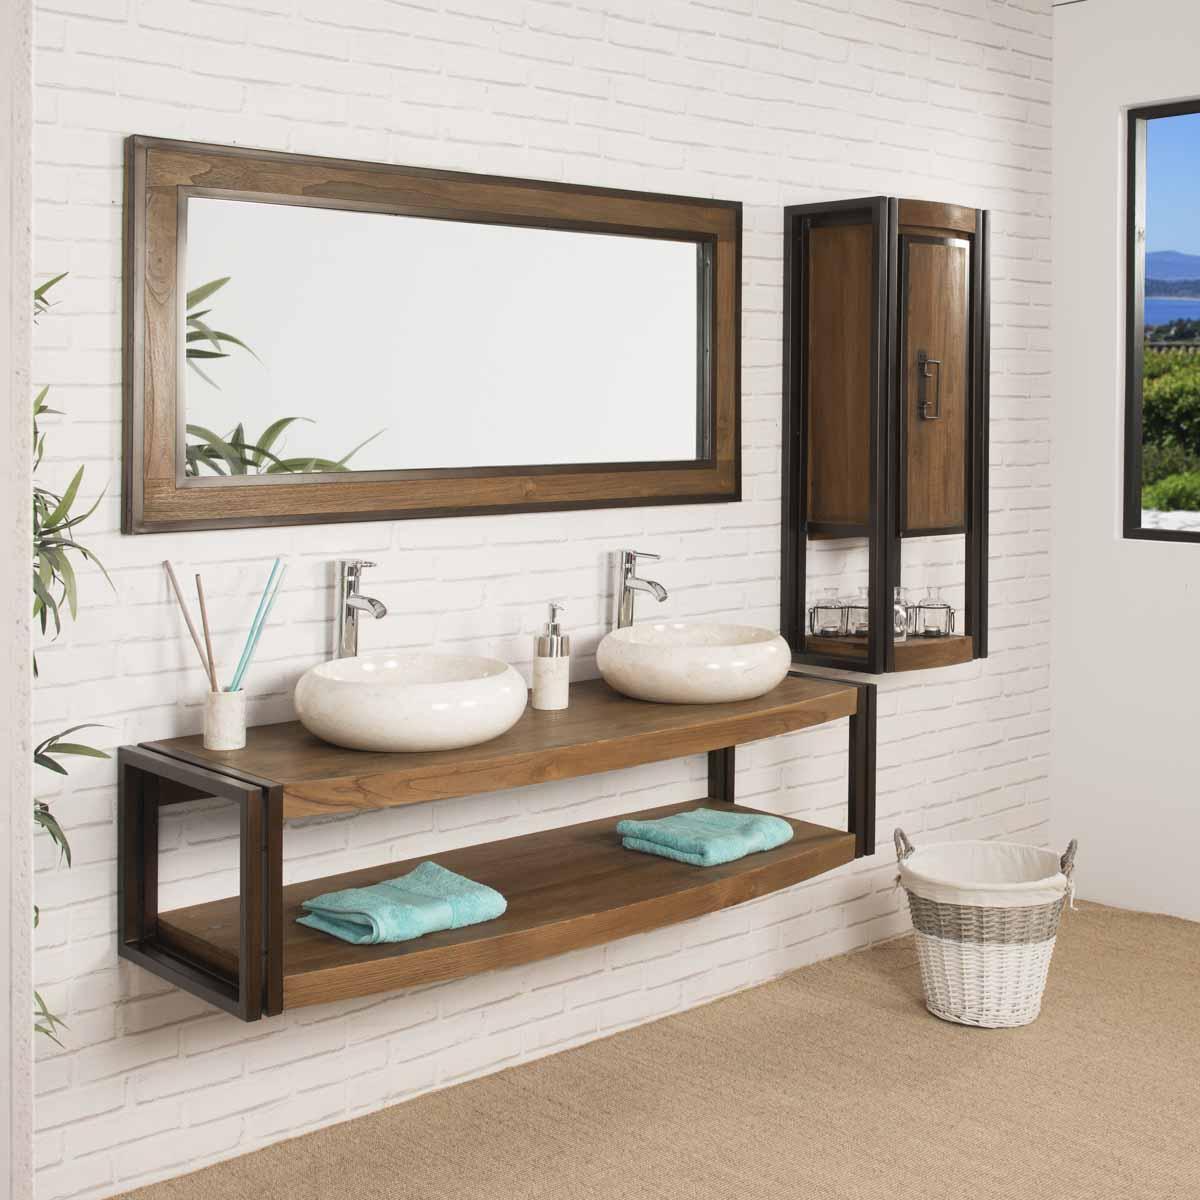 Grand miroir de salle de bain el gance teck m tal 145x70 - Miroir teck salle de bain ...